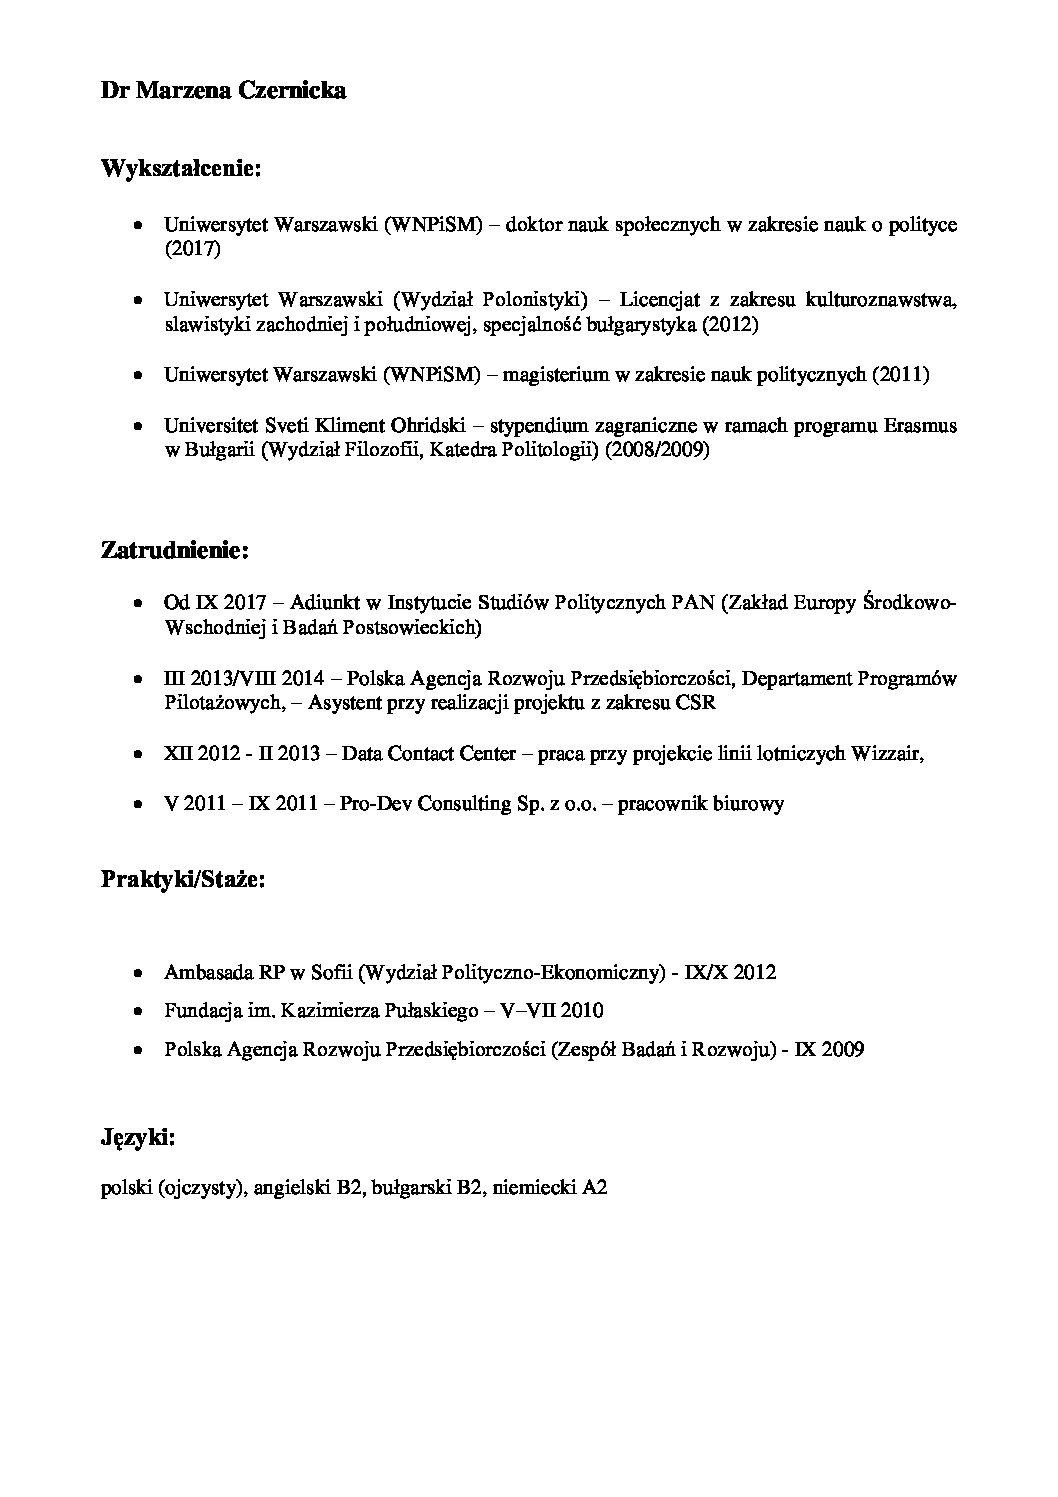 Curriculum Vitae Instytut Studiów Politycznych Pan